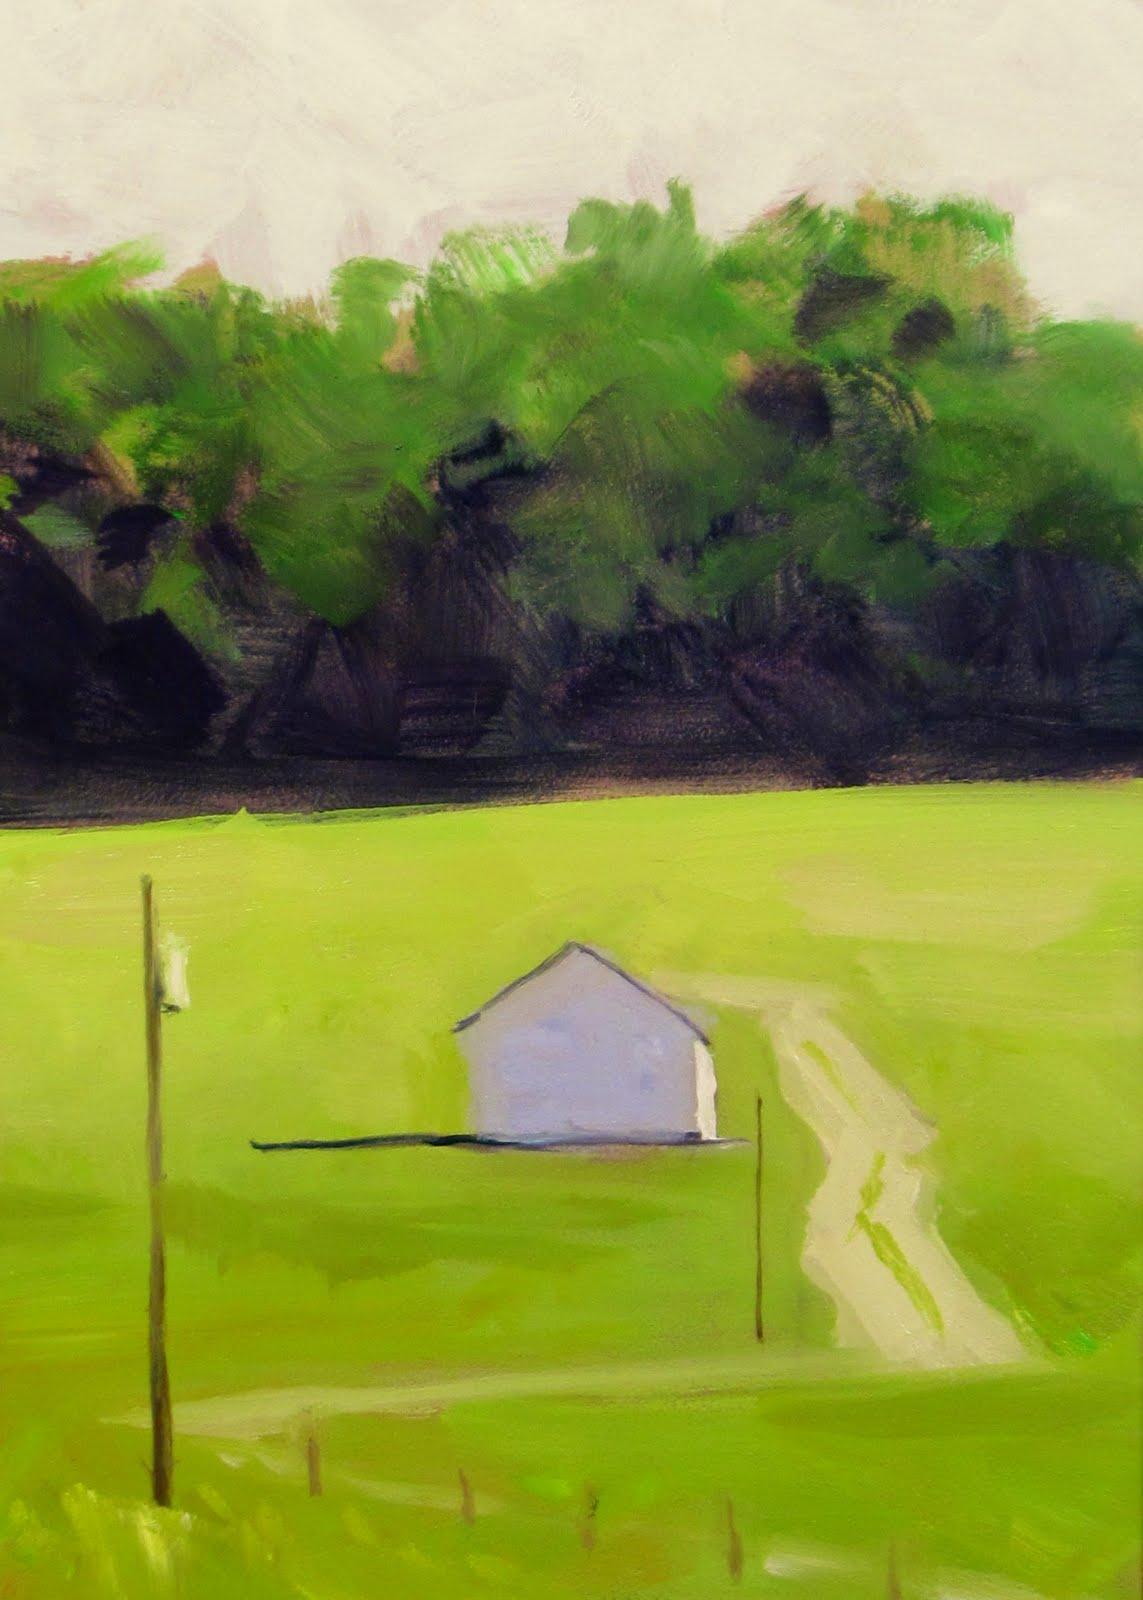 """ART 4 DIAPERS (DAILY DIAPER #163) The Lonely Barn"" original fine art by Brian Burt"